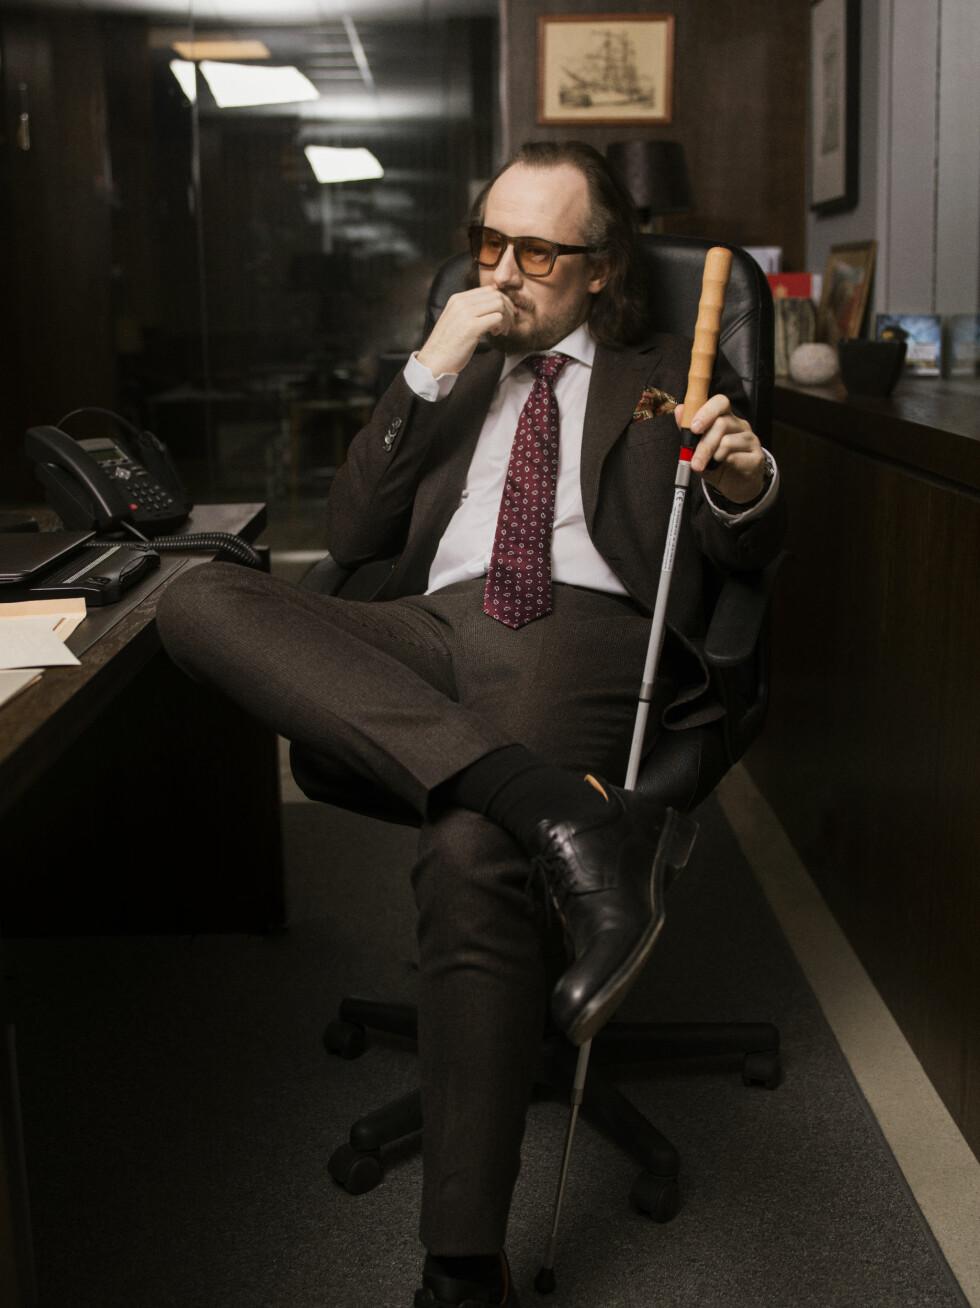 MAGNUS BRATSETH: Torgny Gerhard Aanderaa spiller den blinde advokatpartneren. Foto: TV3